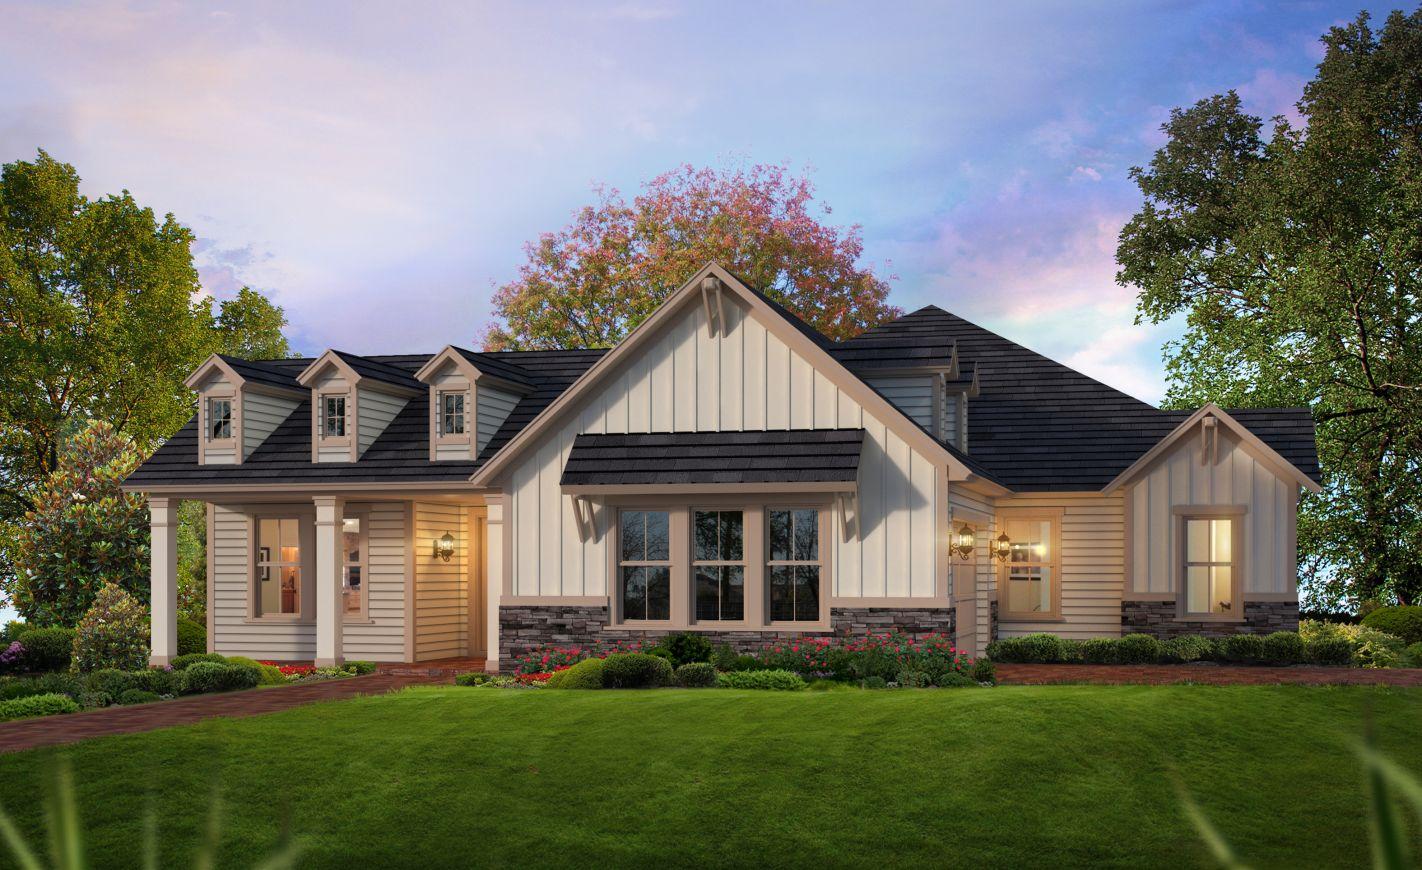 New Homes for Sale Ormond Beach FL - The Santa Cruz at Plantation Bay